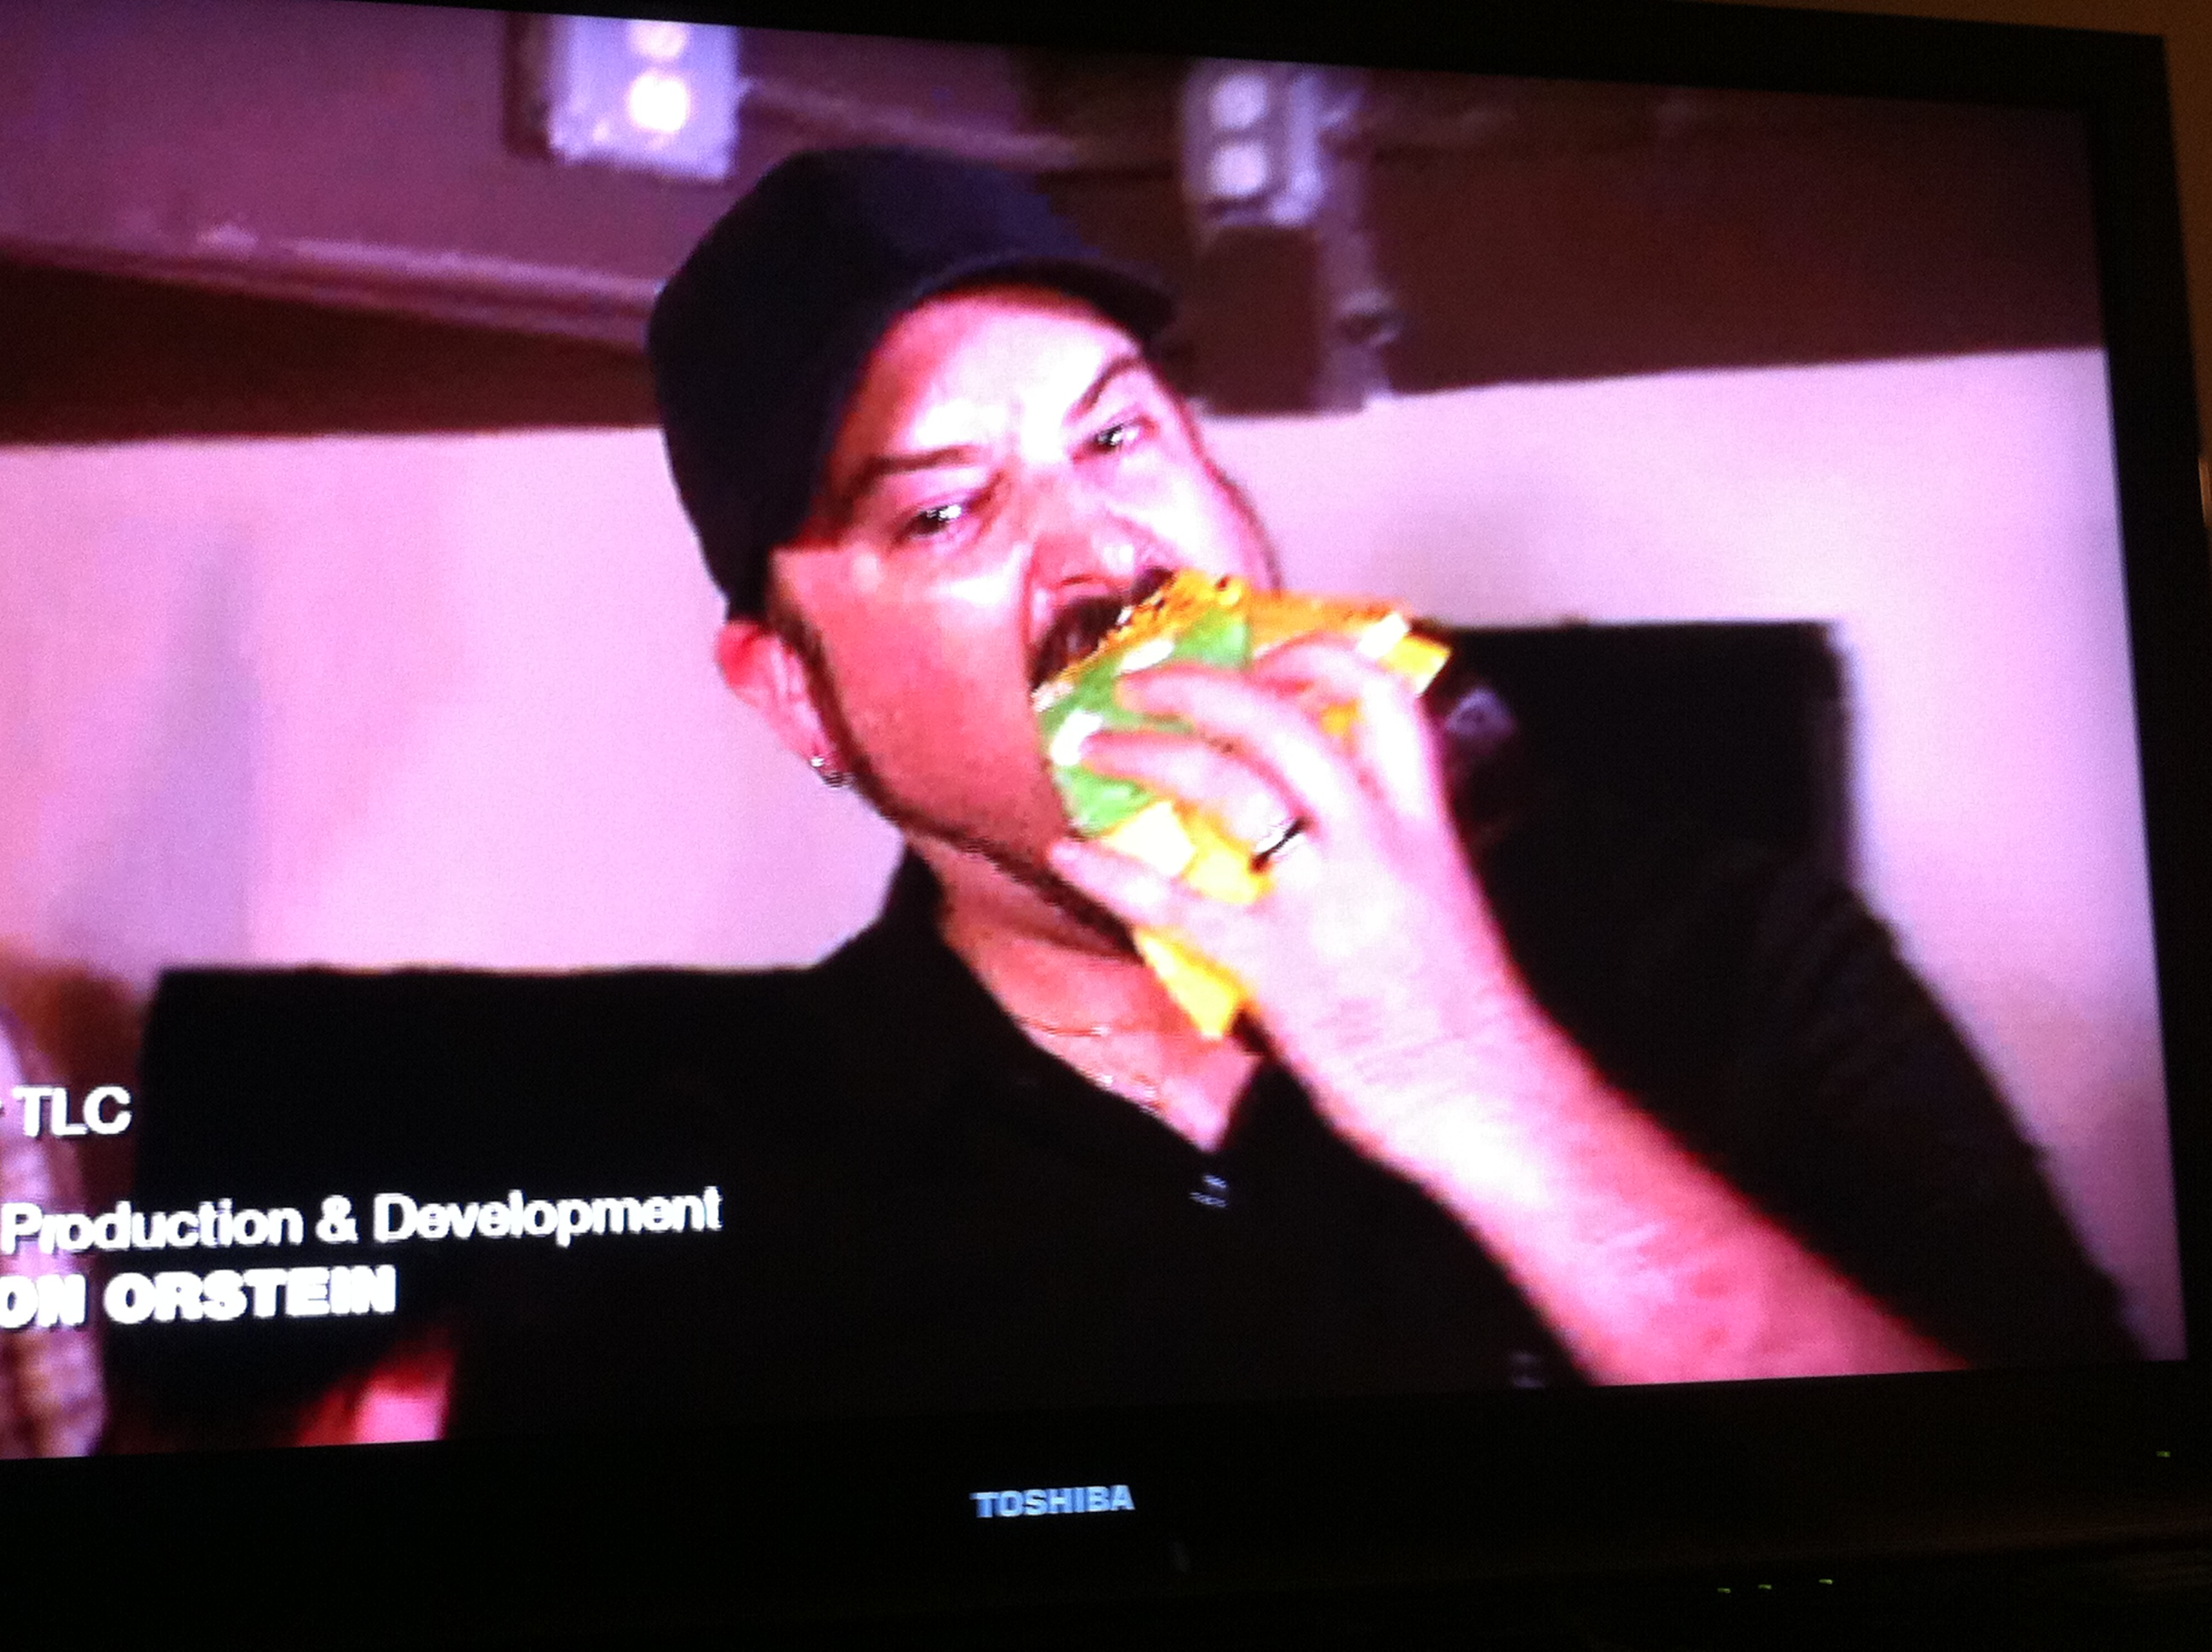 david-rev-ciancio-expert-burger-taster-burger-business-burger-famous-tv_1462